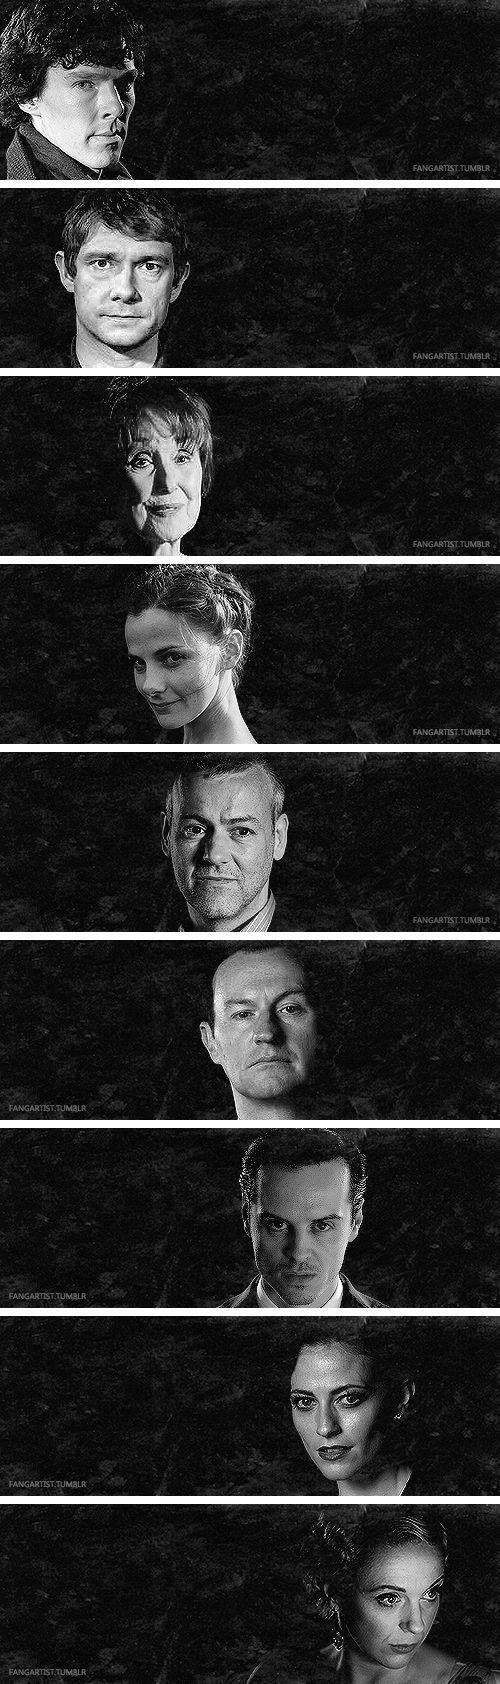 Cast : Benedict Cumberbatch - Martin Freeman - Una Stubbs - Louise Brealey - Rupert Graves - Martin Gatiss - Andrew Scott - Lara Pulver - Amanda Abbington